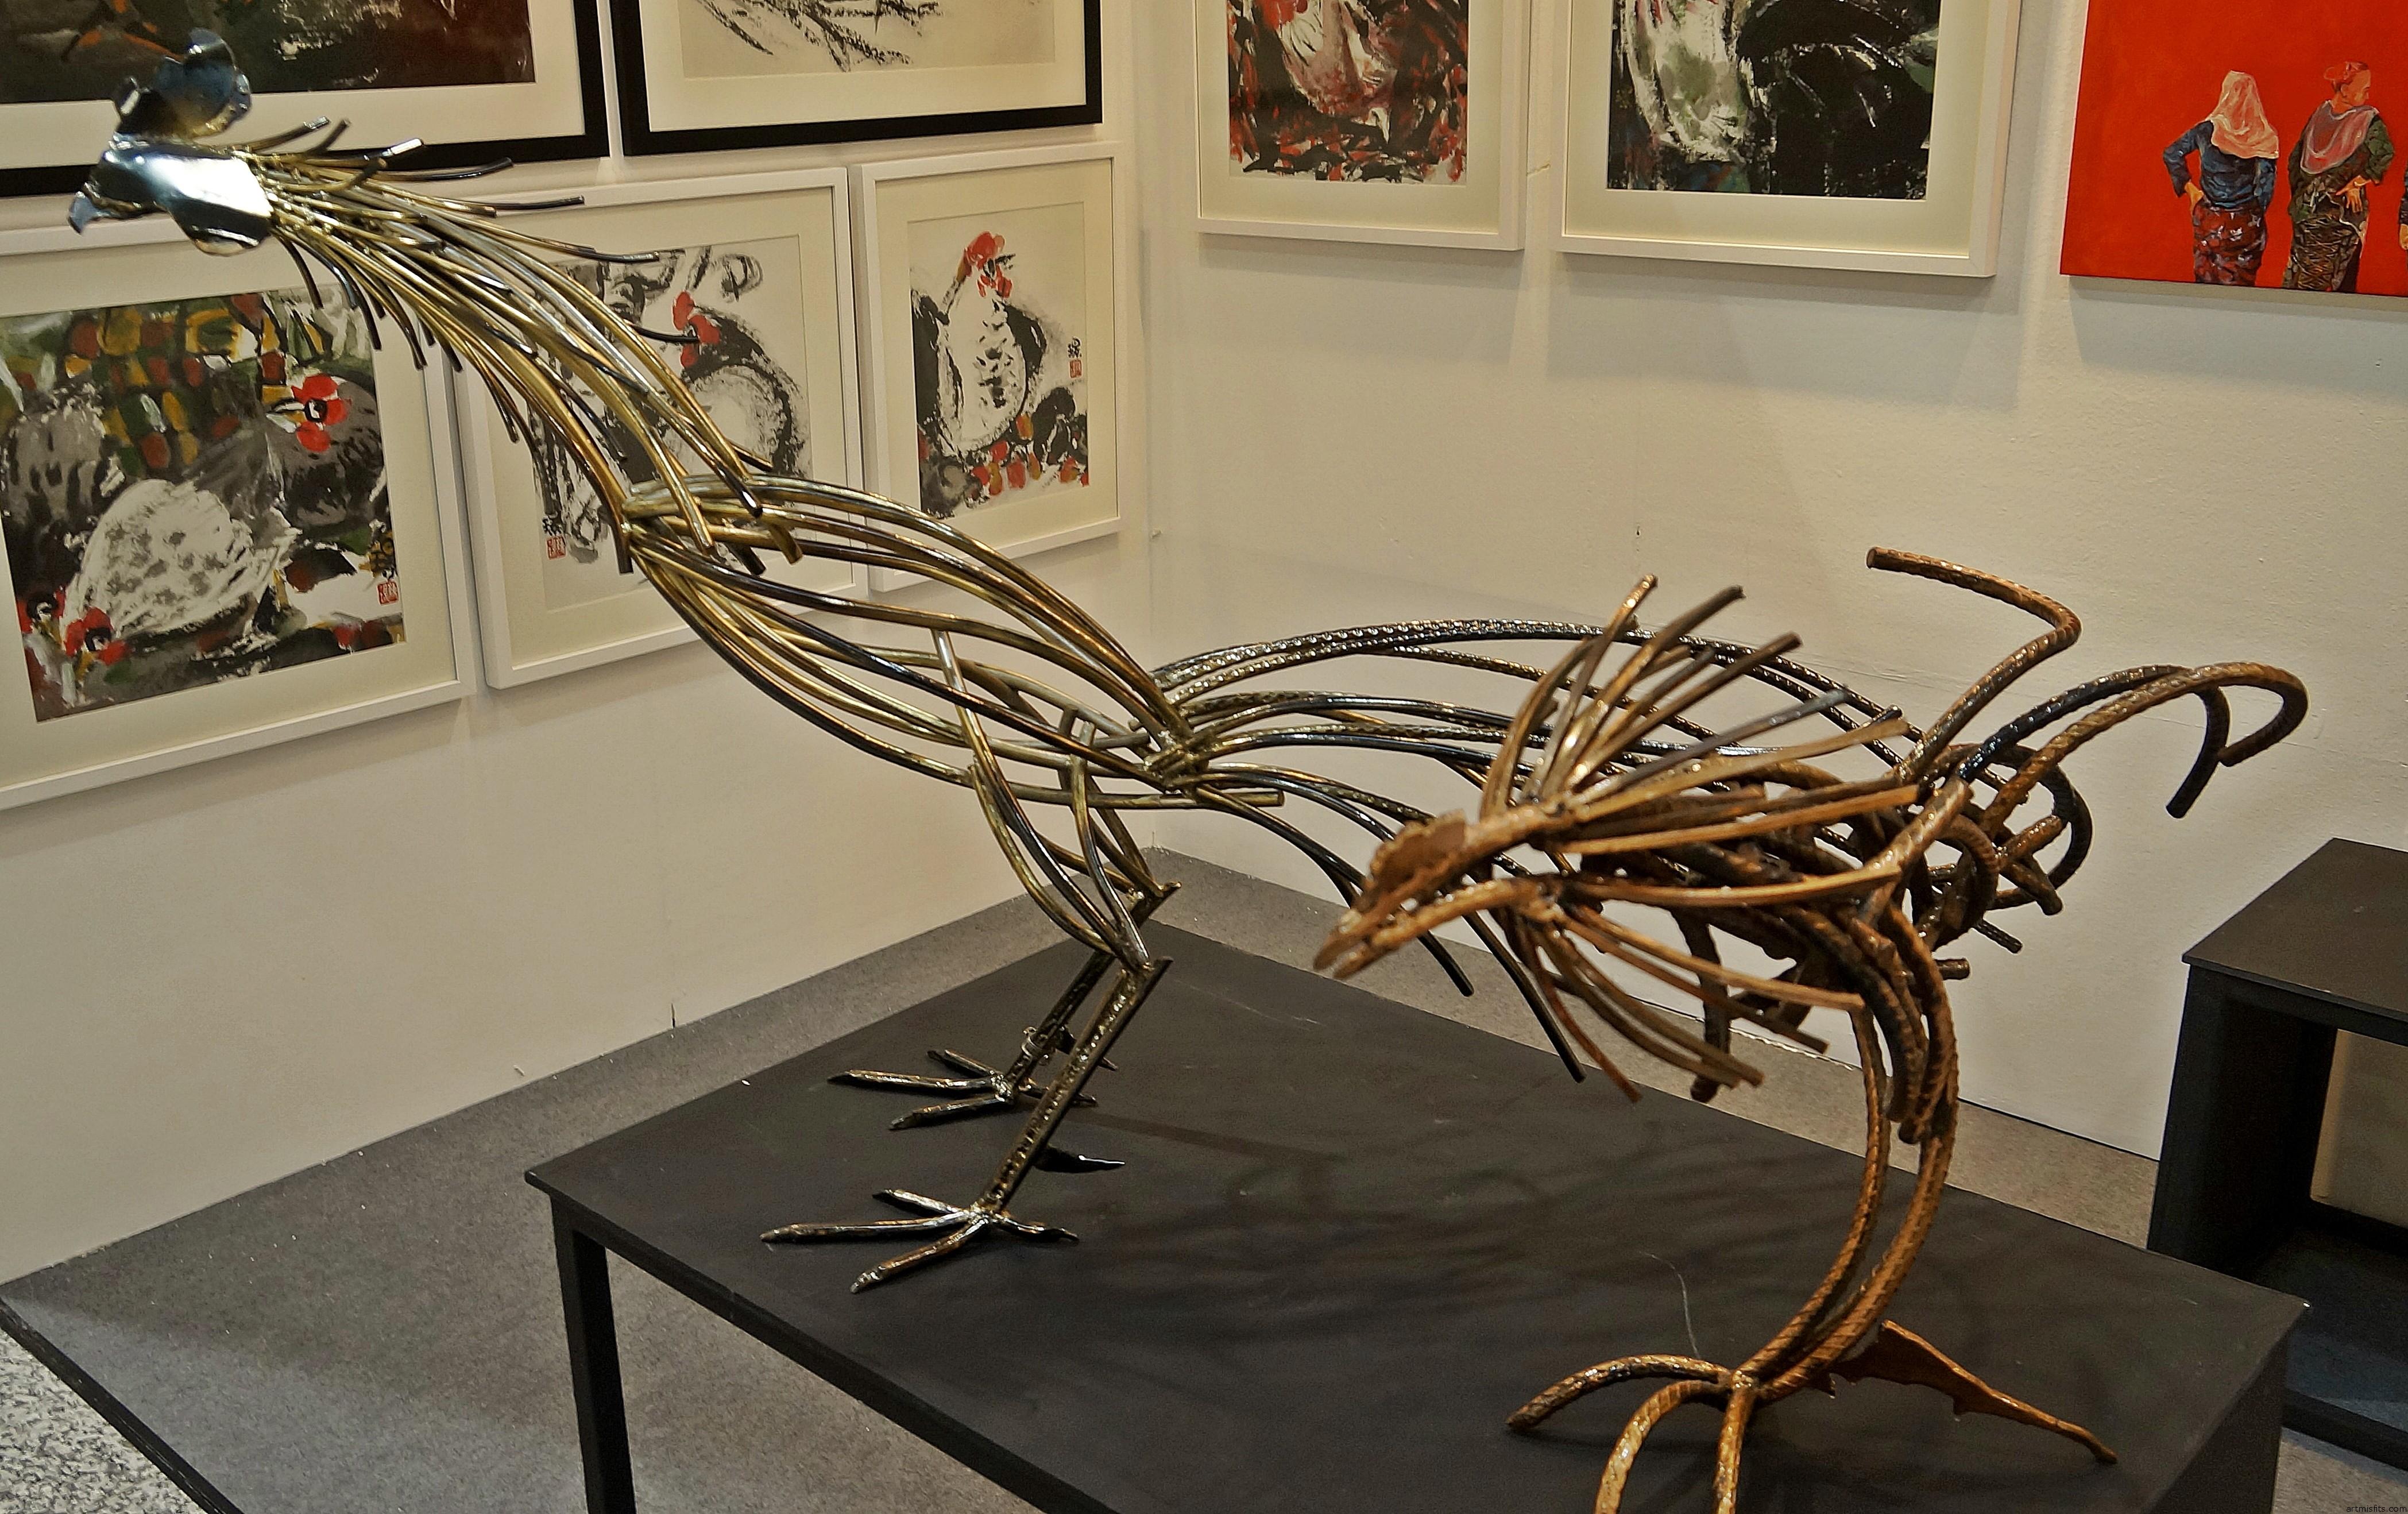 Art Misfits Art Expo 2013 35